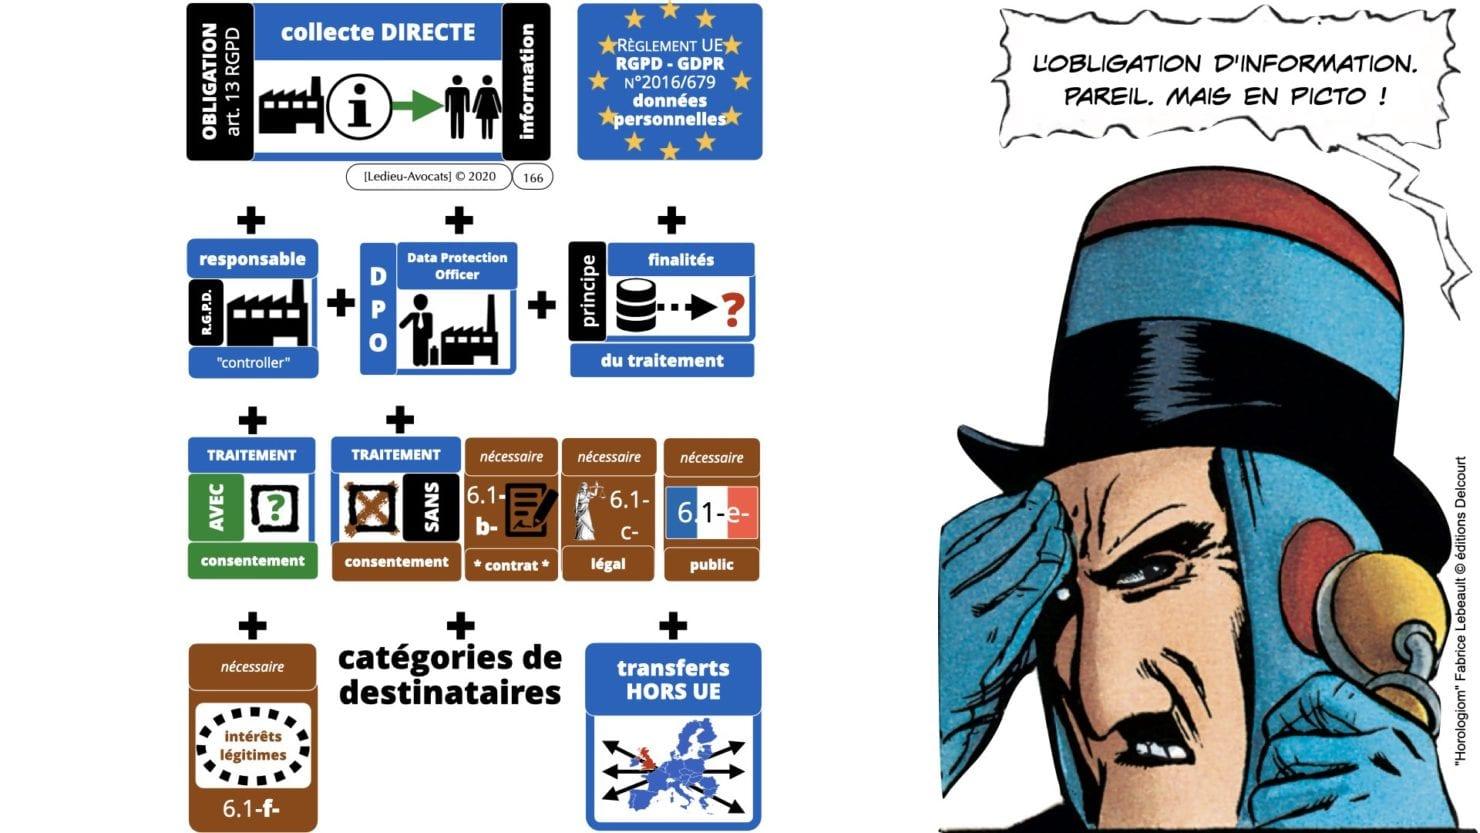 RGPD e-Privacy principes actualité jurisprudence ©Ledieu-Avocats 25-06-2021.166